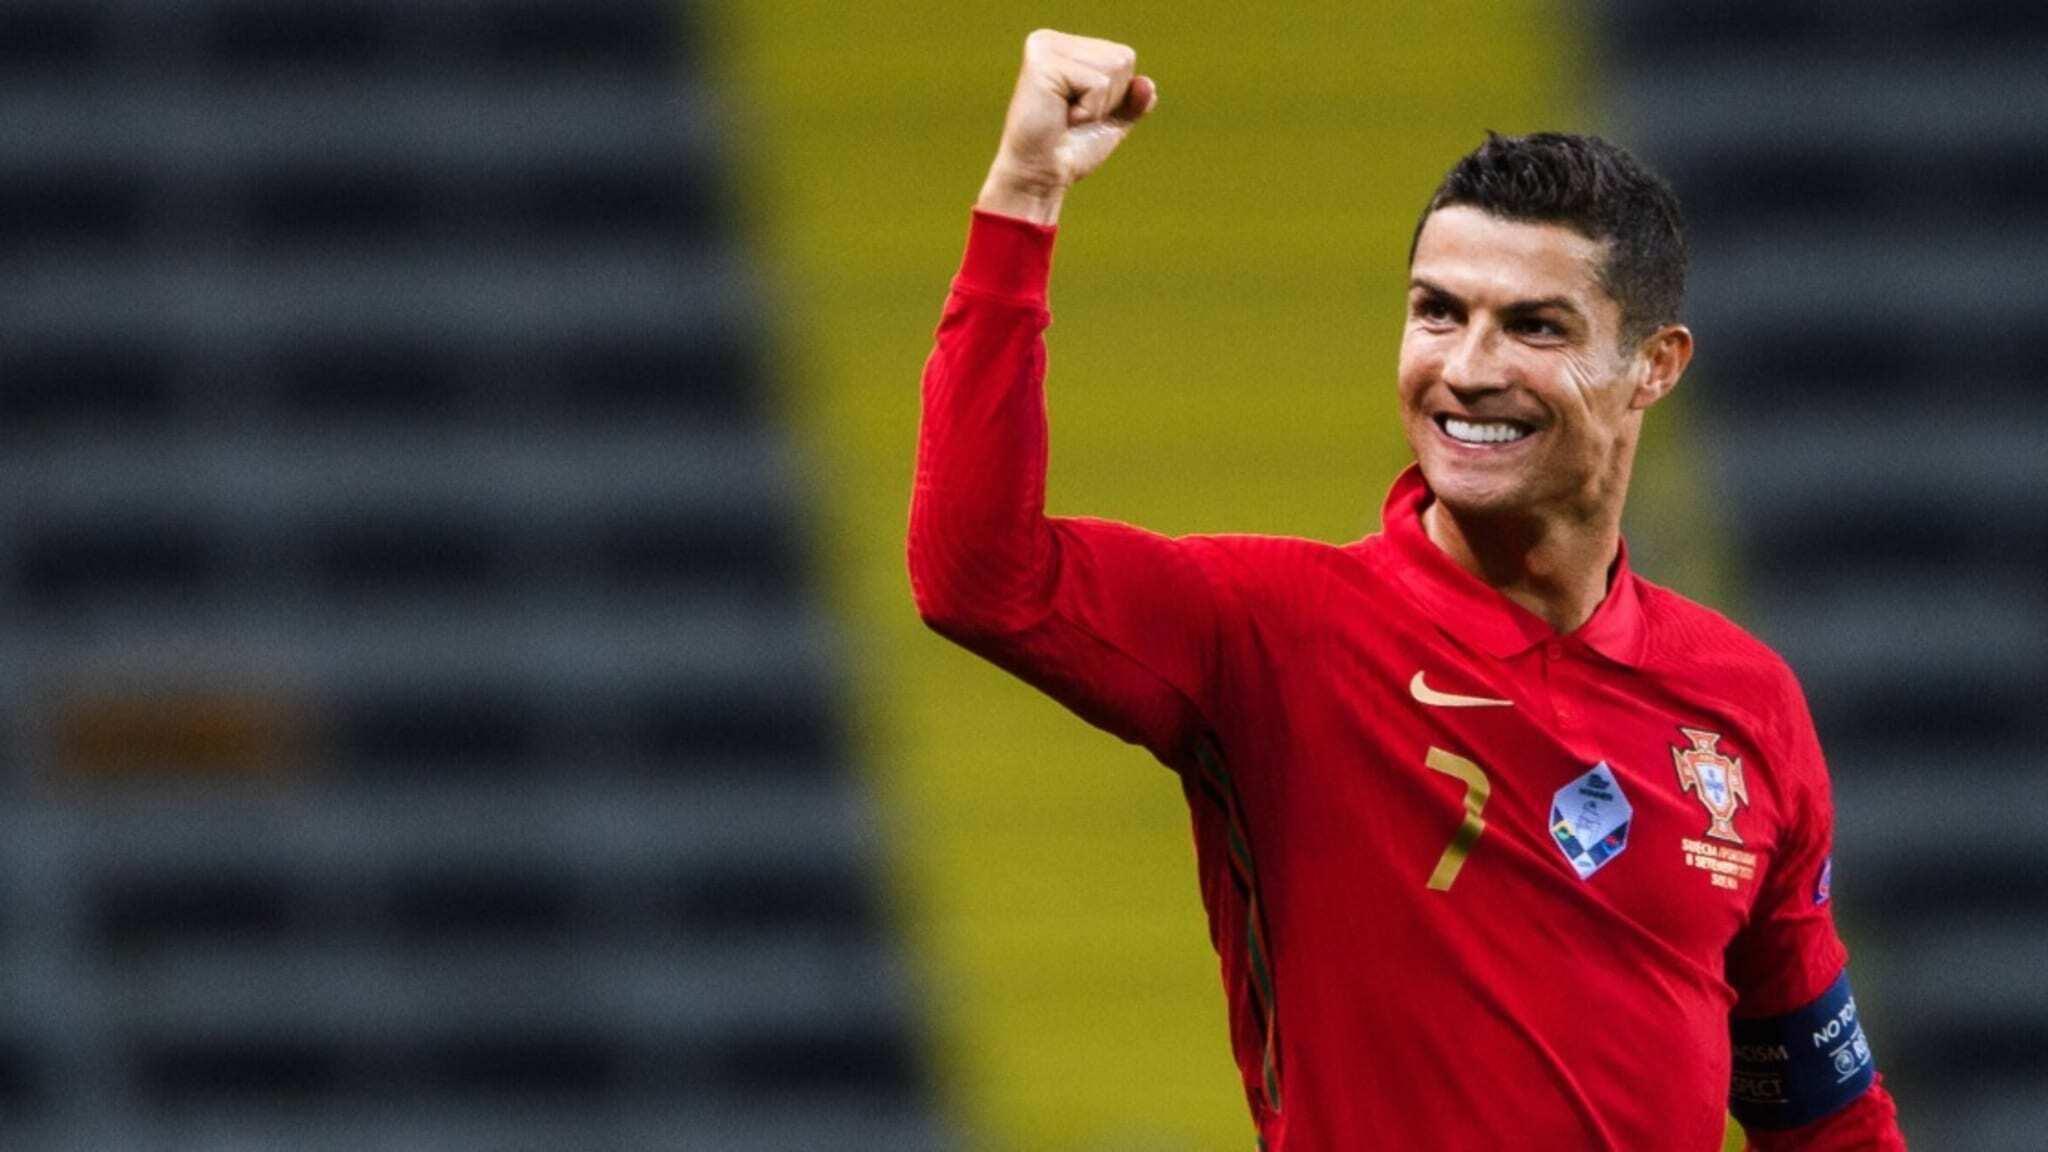 Cristiano Ronaldo arm up